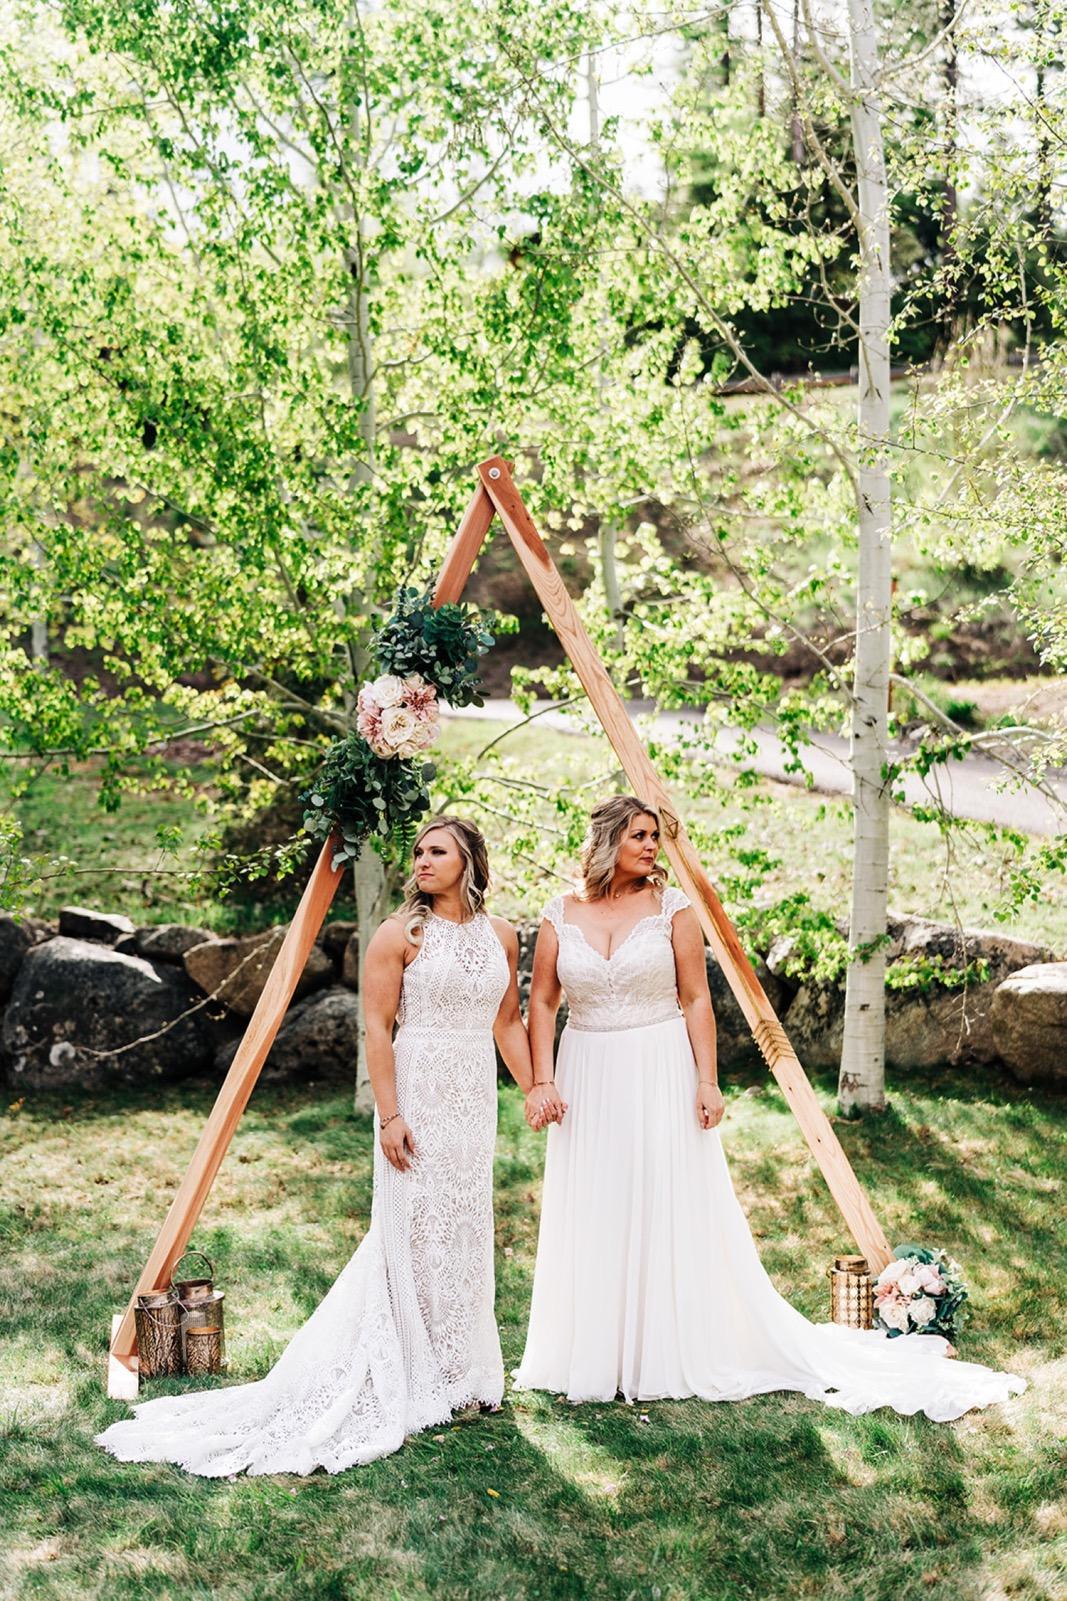 159_falissa_heather_wedding-329.jpg